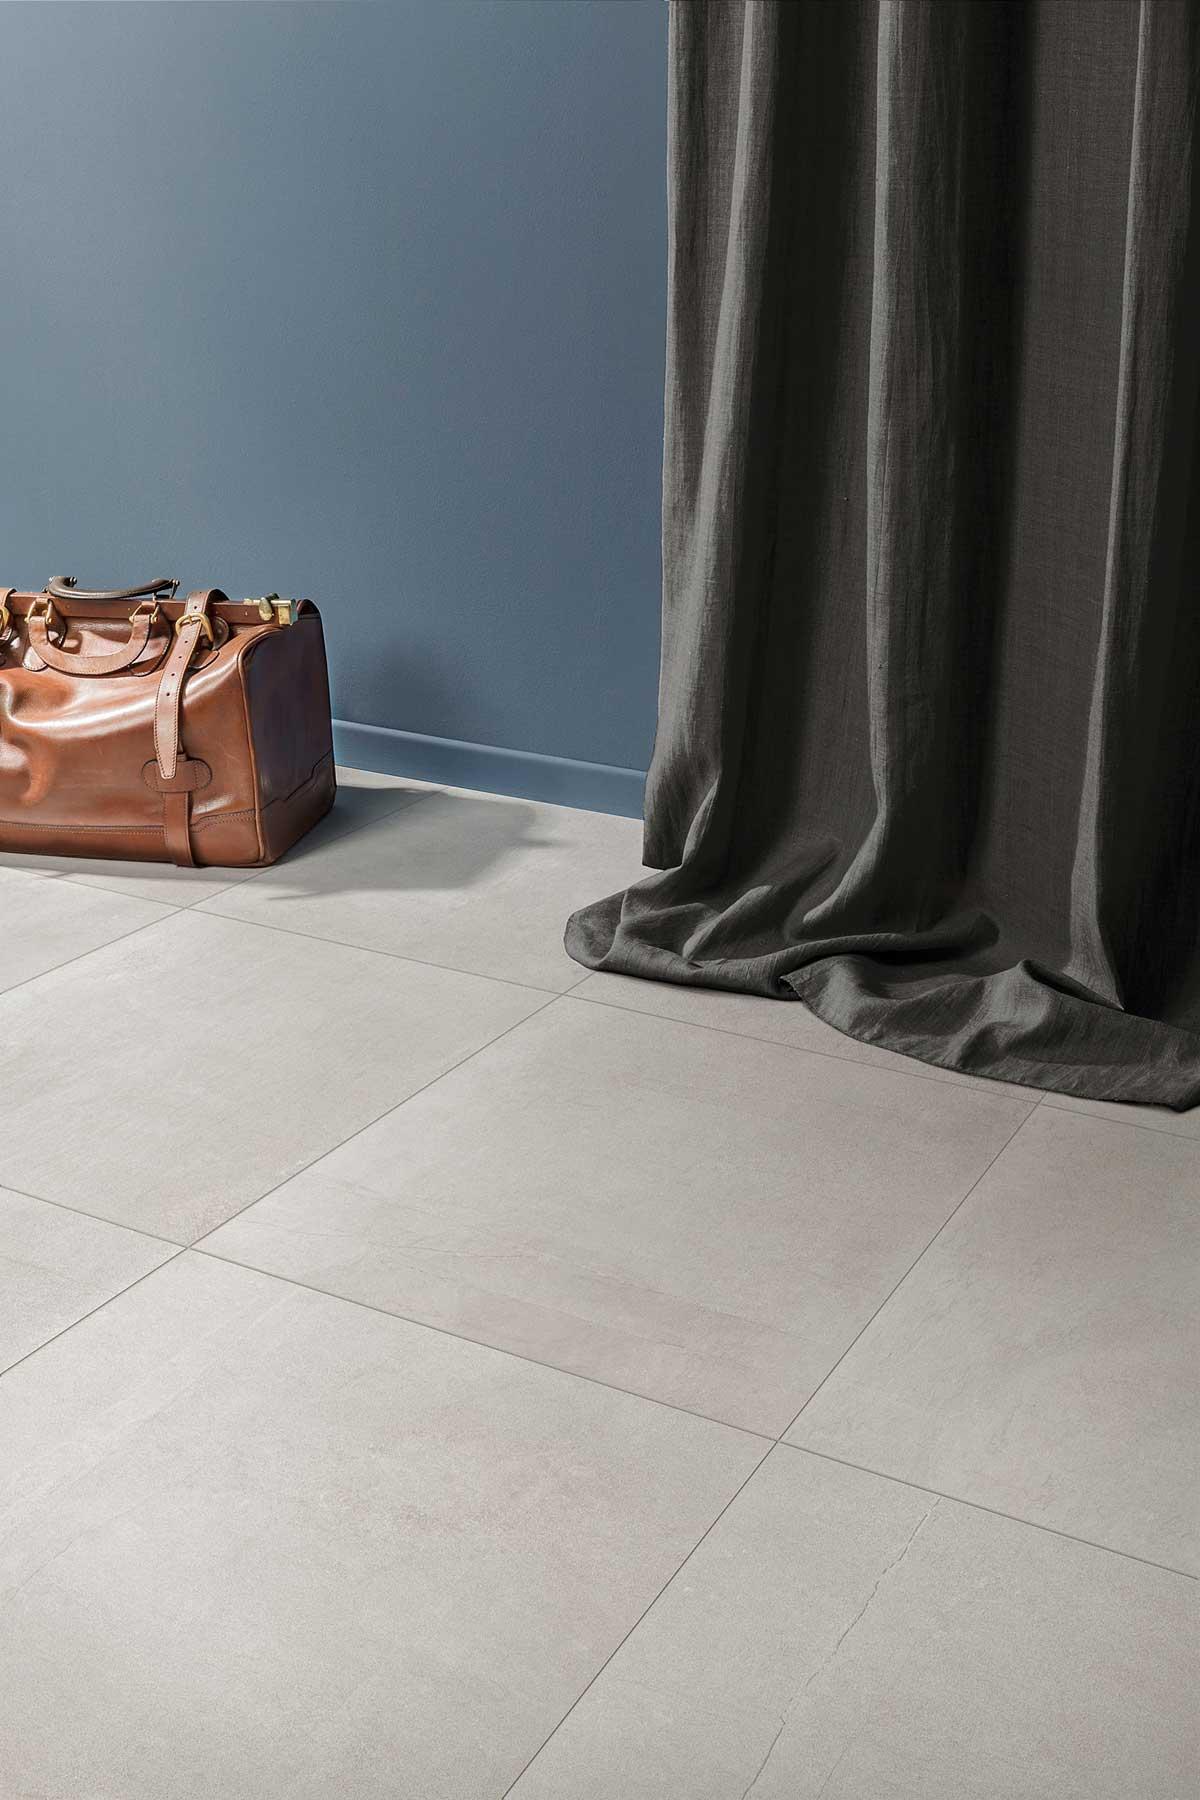 Novemb3r The Novemb3r Collection Of Ceramic Tiles Mirage Mirage